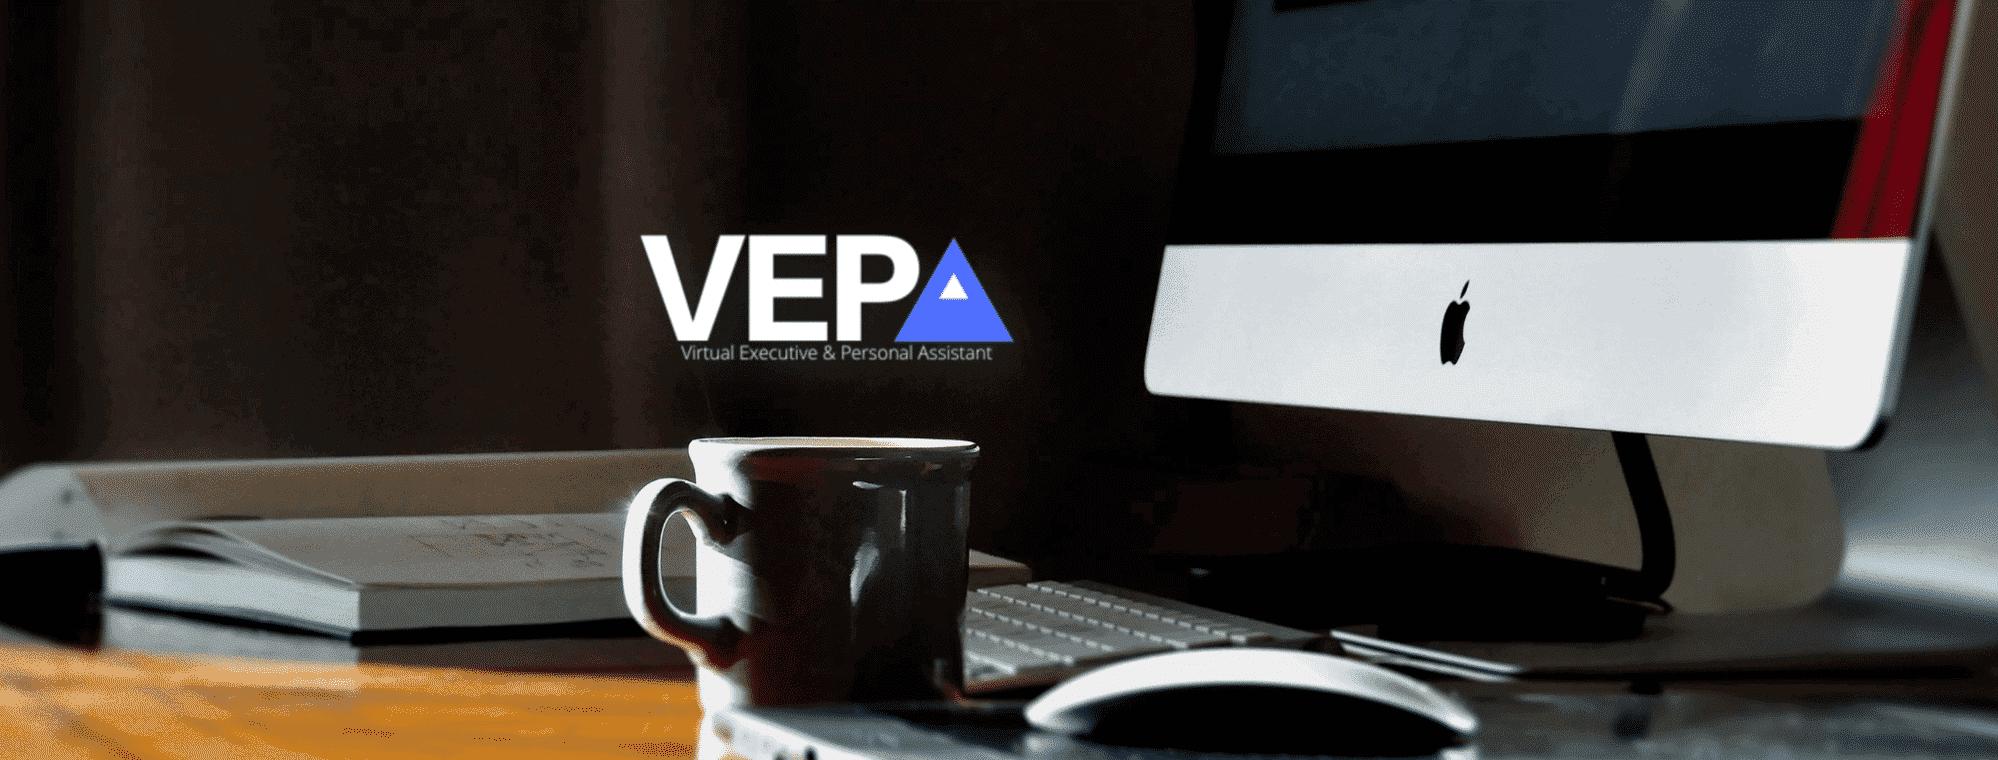 VEPA - Virtual Executive & Personal Assistant